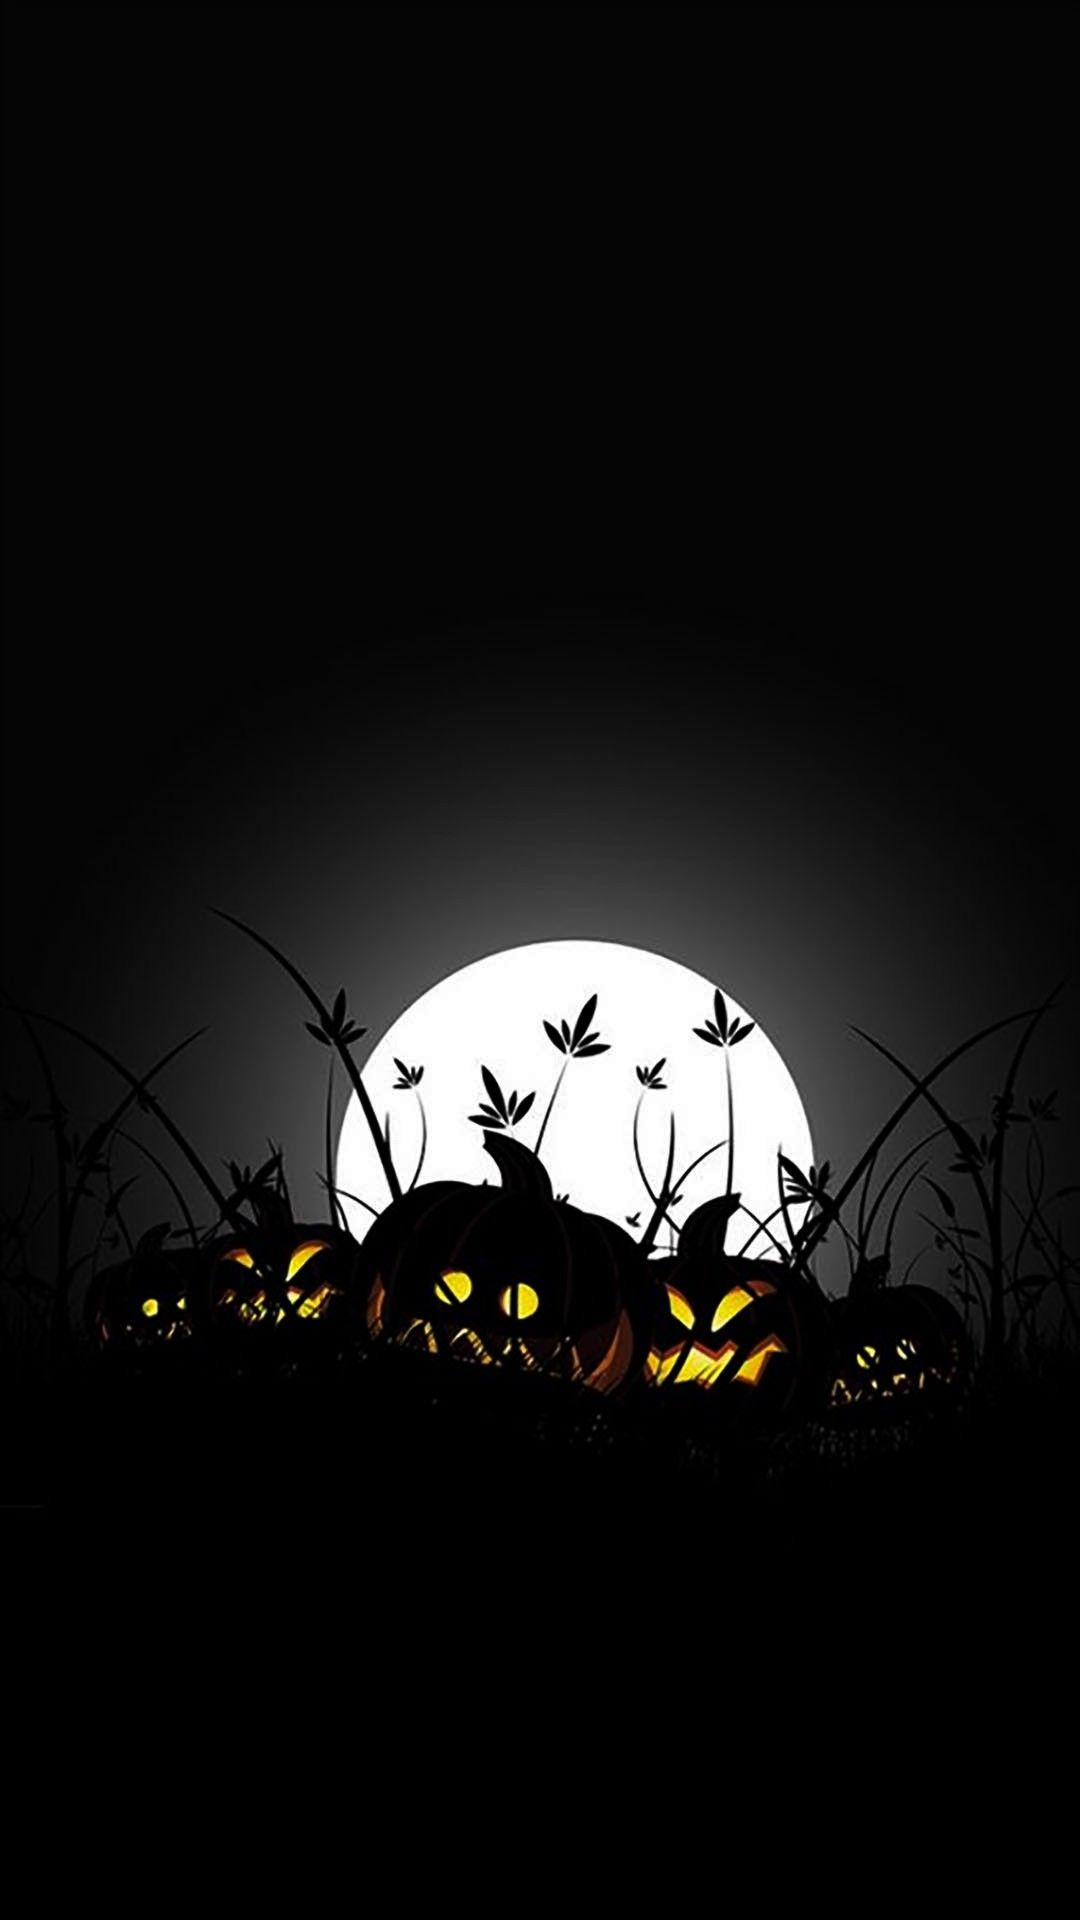 Amoled Halloween Wallpaper Halloween Wallpaper Iphone Halloween Illustration